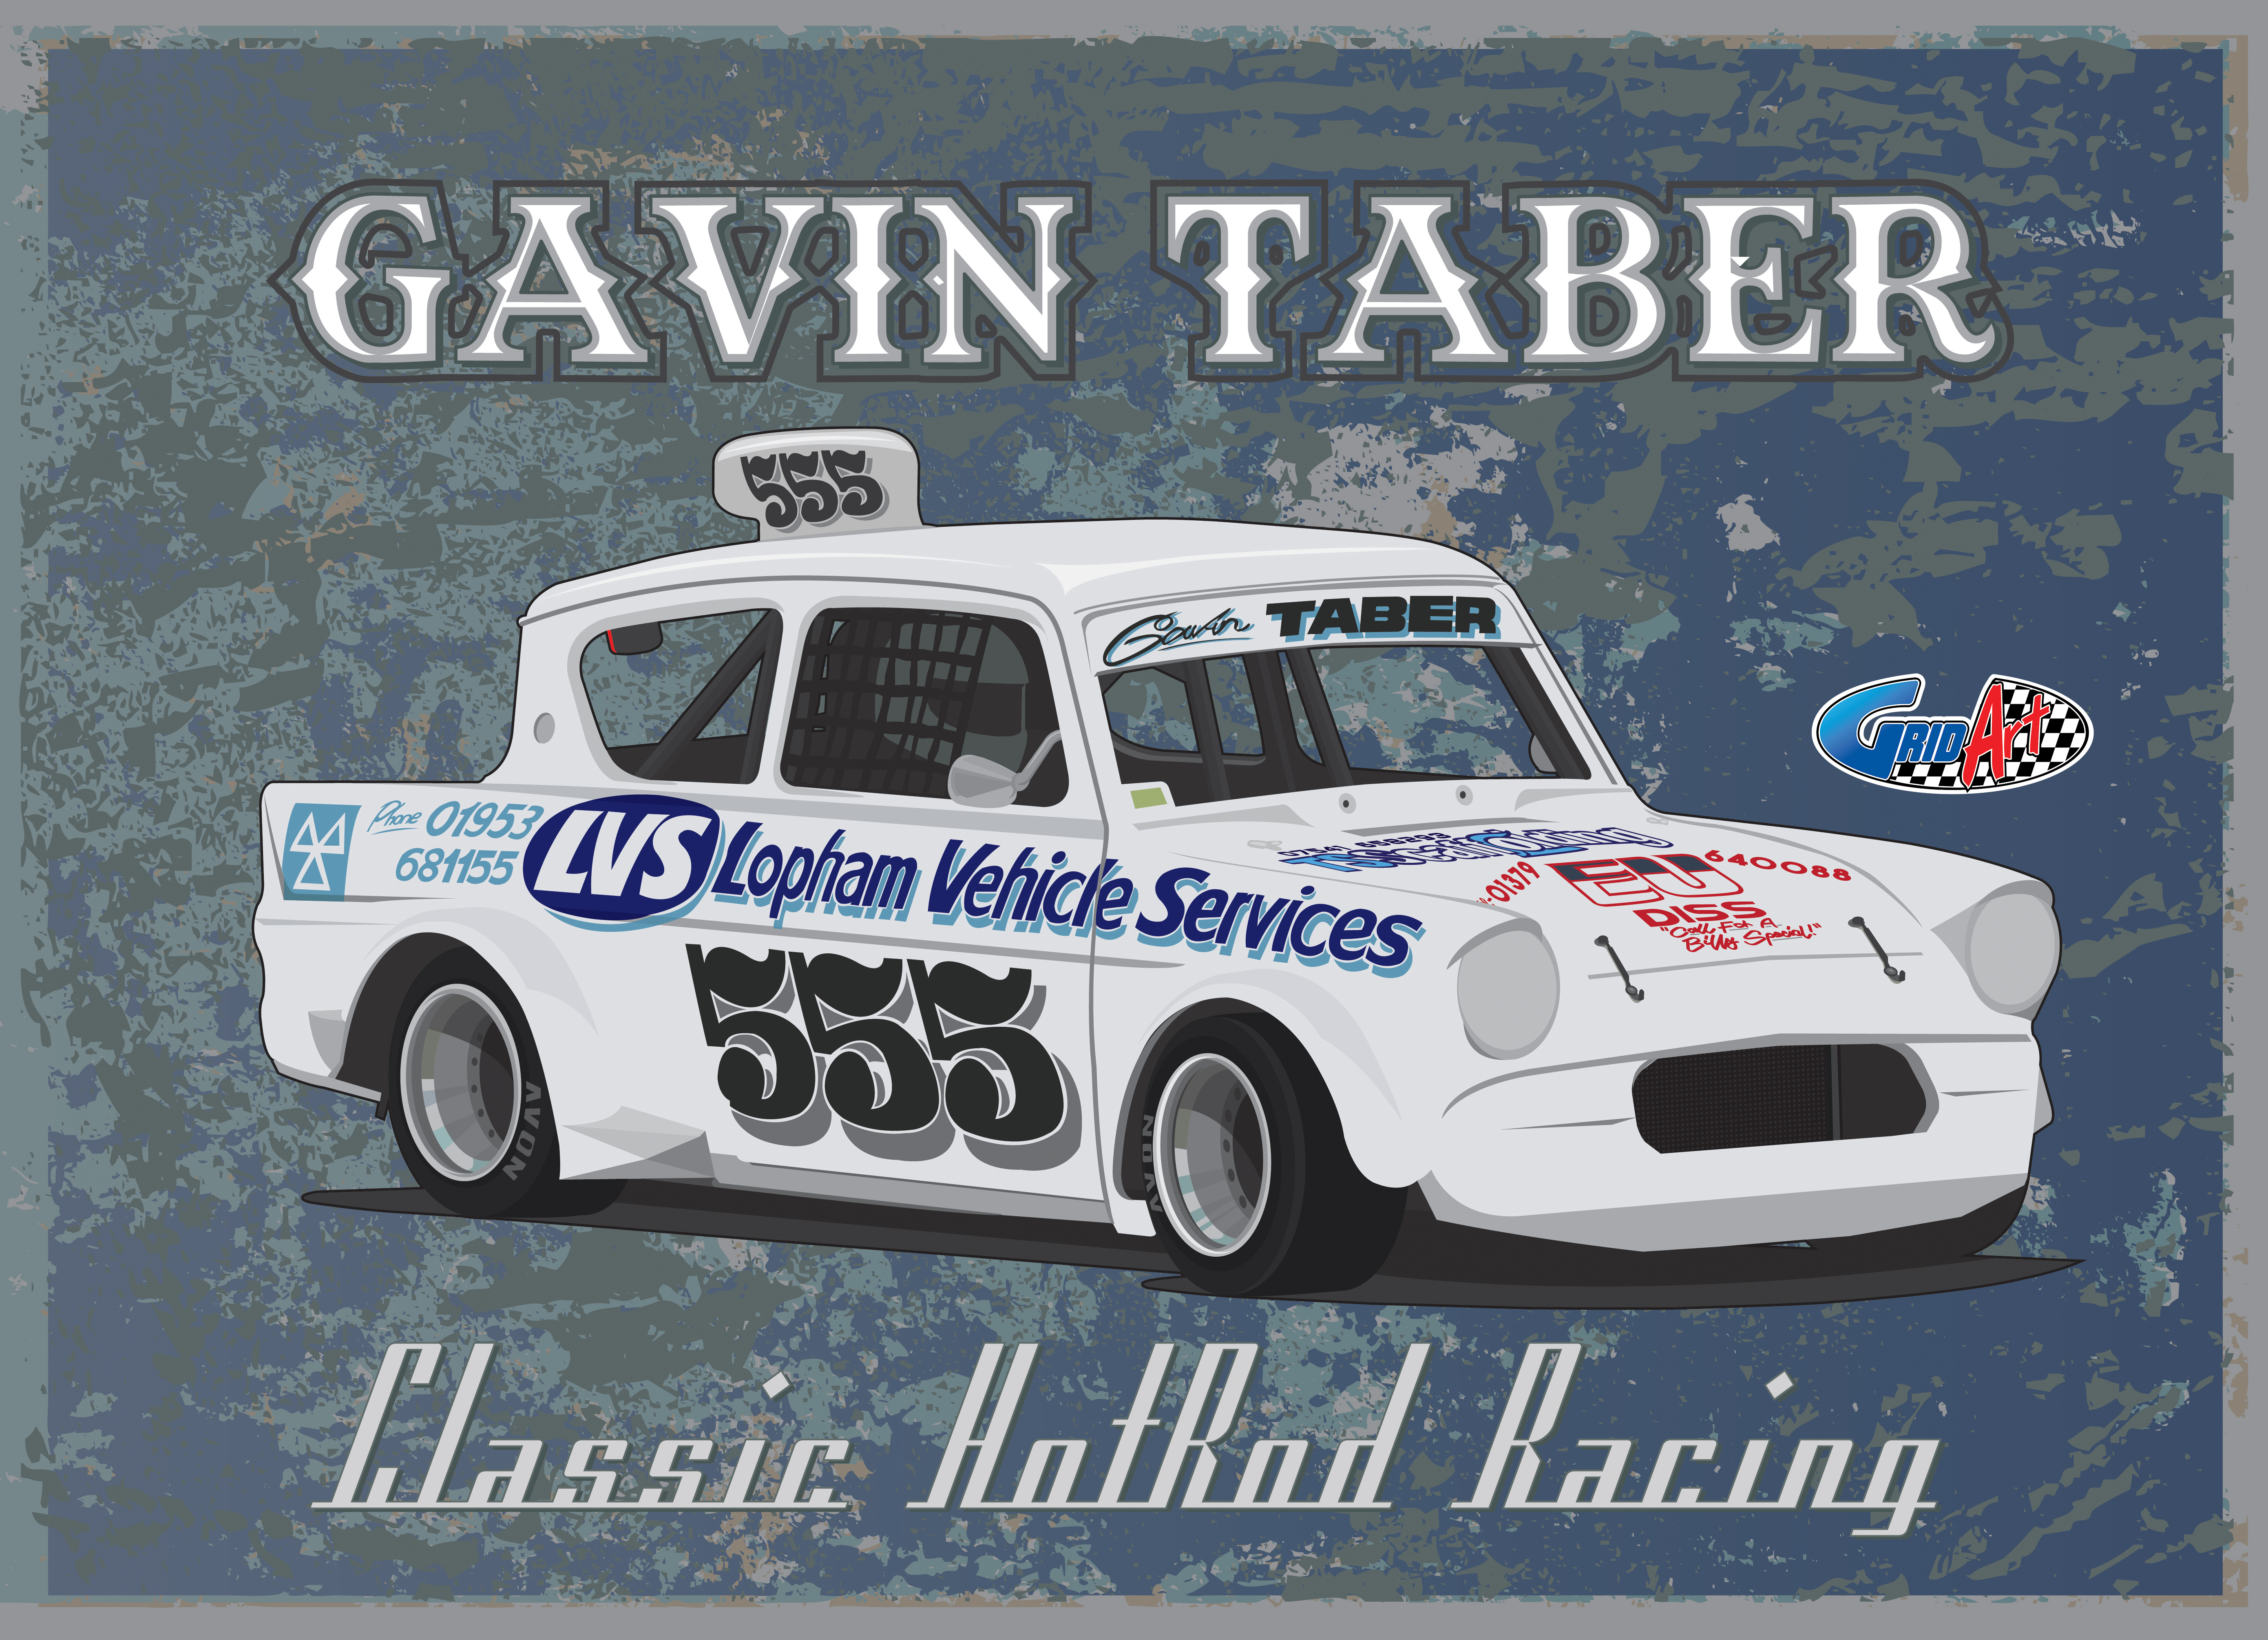 Classic Hot Rod 555 Gavin Taber